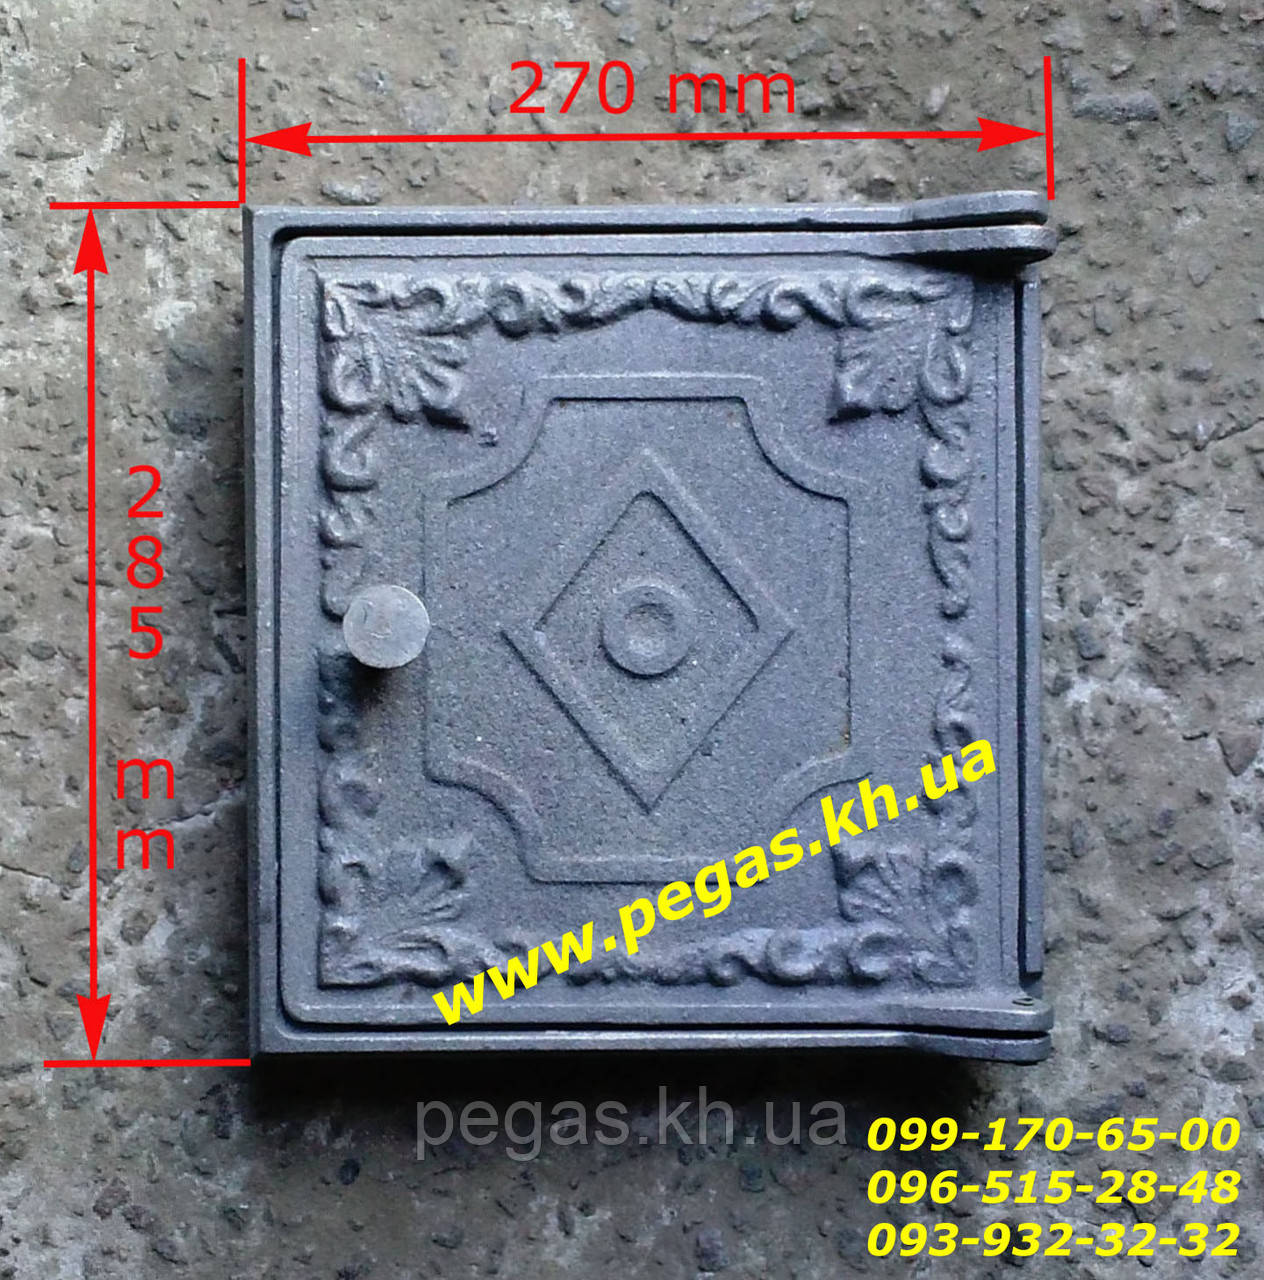 Дверка чугунная печная (270х285 мм) грубу, барбекю, мангал, печи